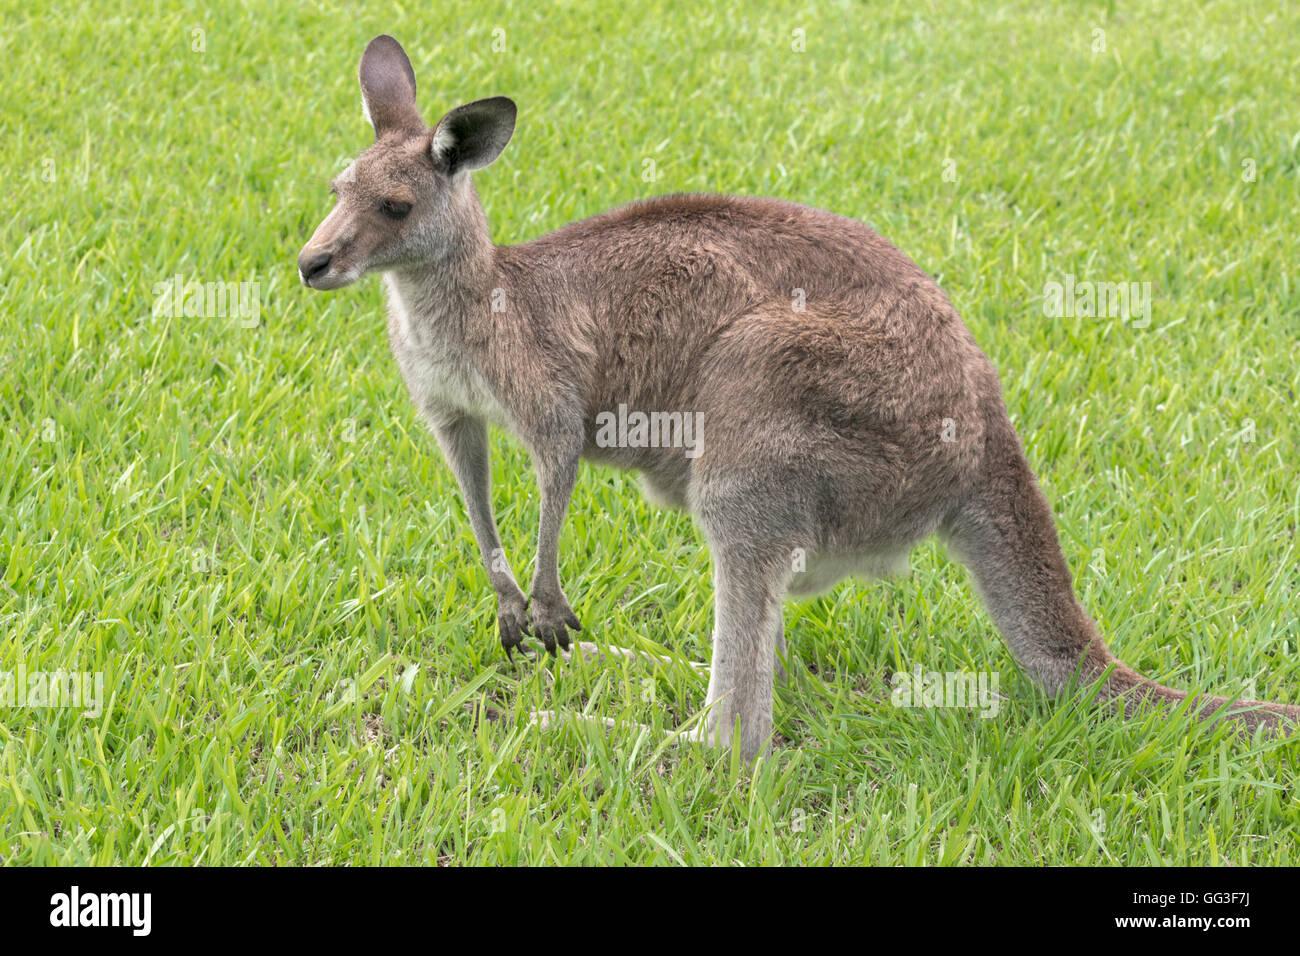 Grigio orientale canguro, Macropus giganteus, fotografato in un semi-urbana impostazione, sud del Queensland, Australia. Immagini Stock